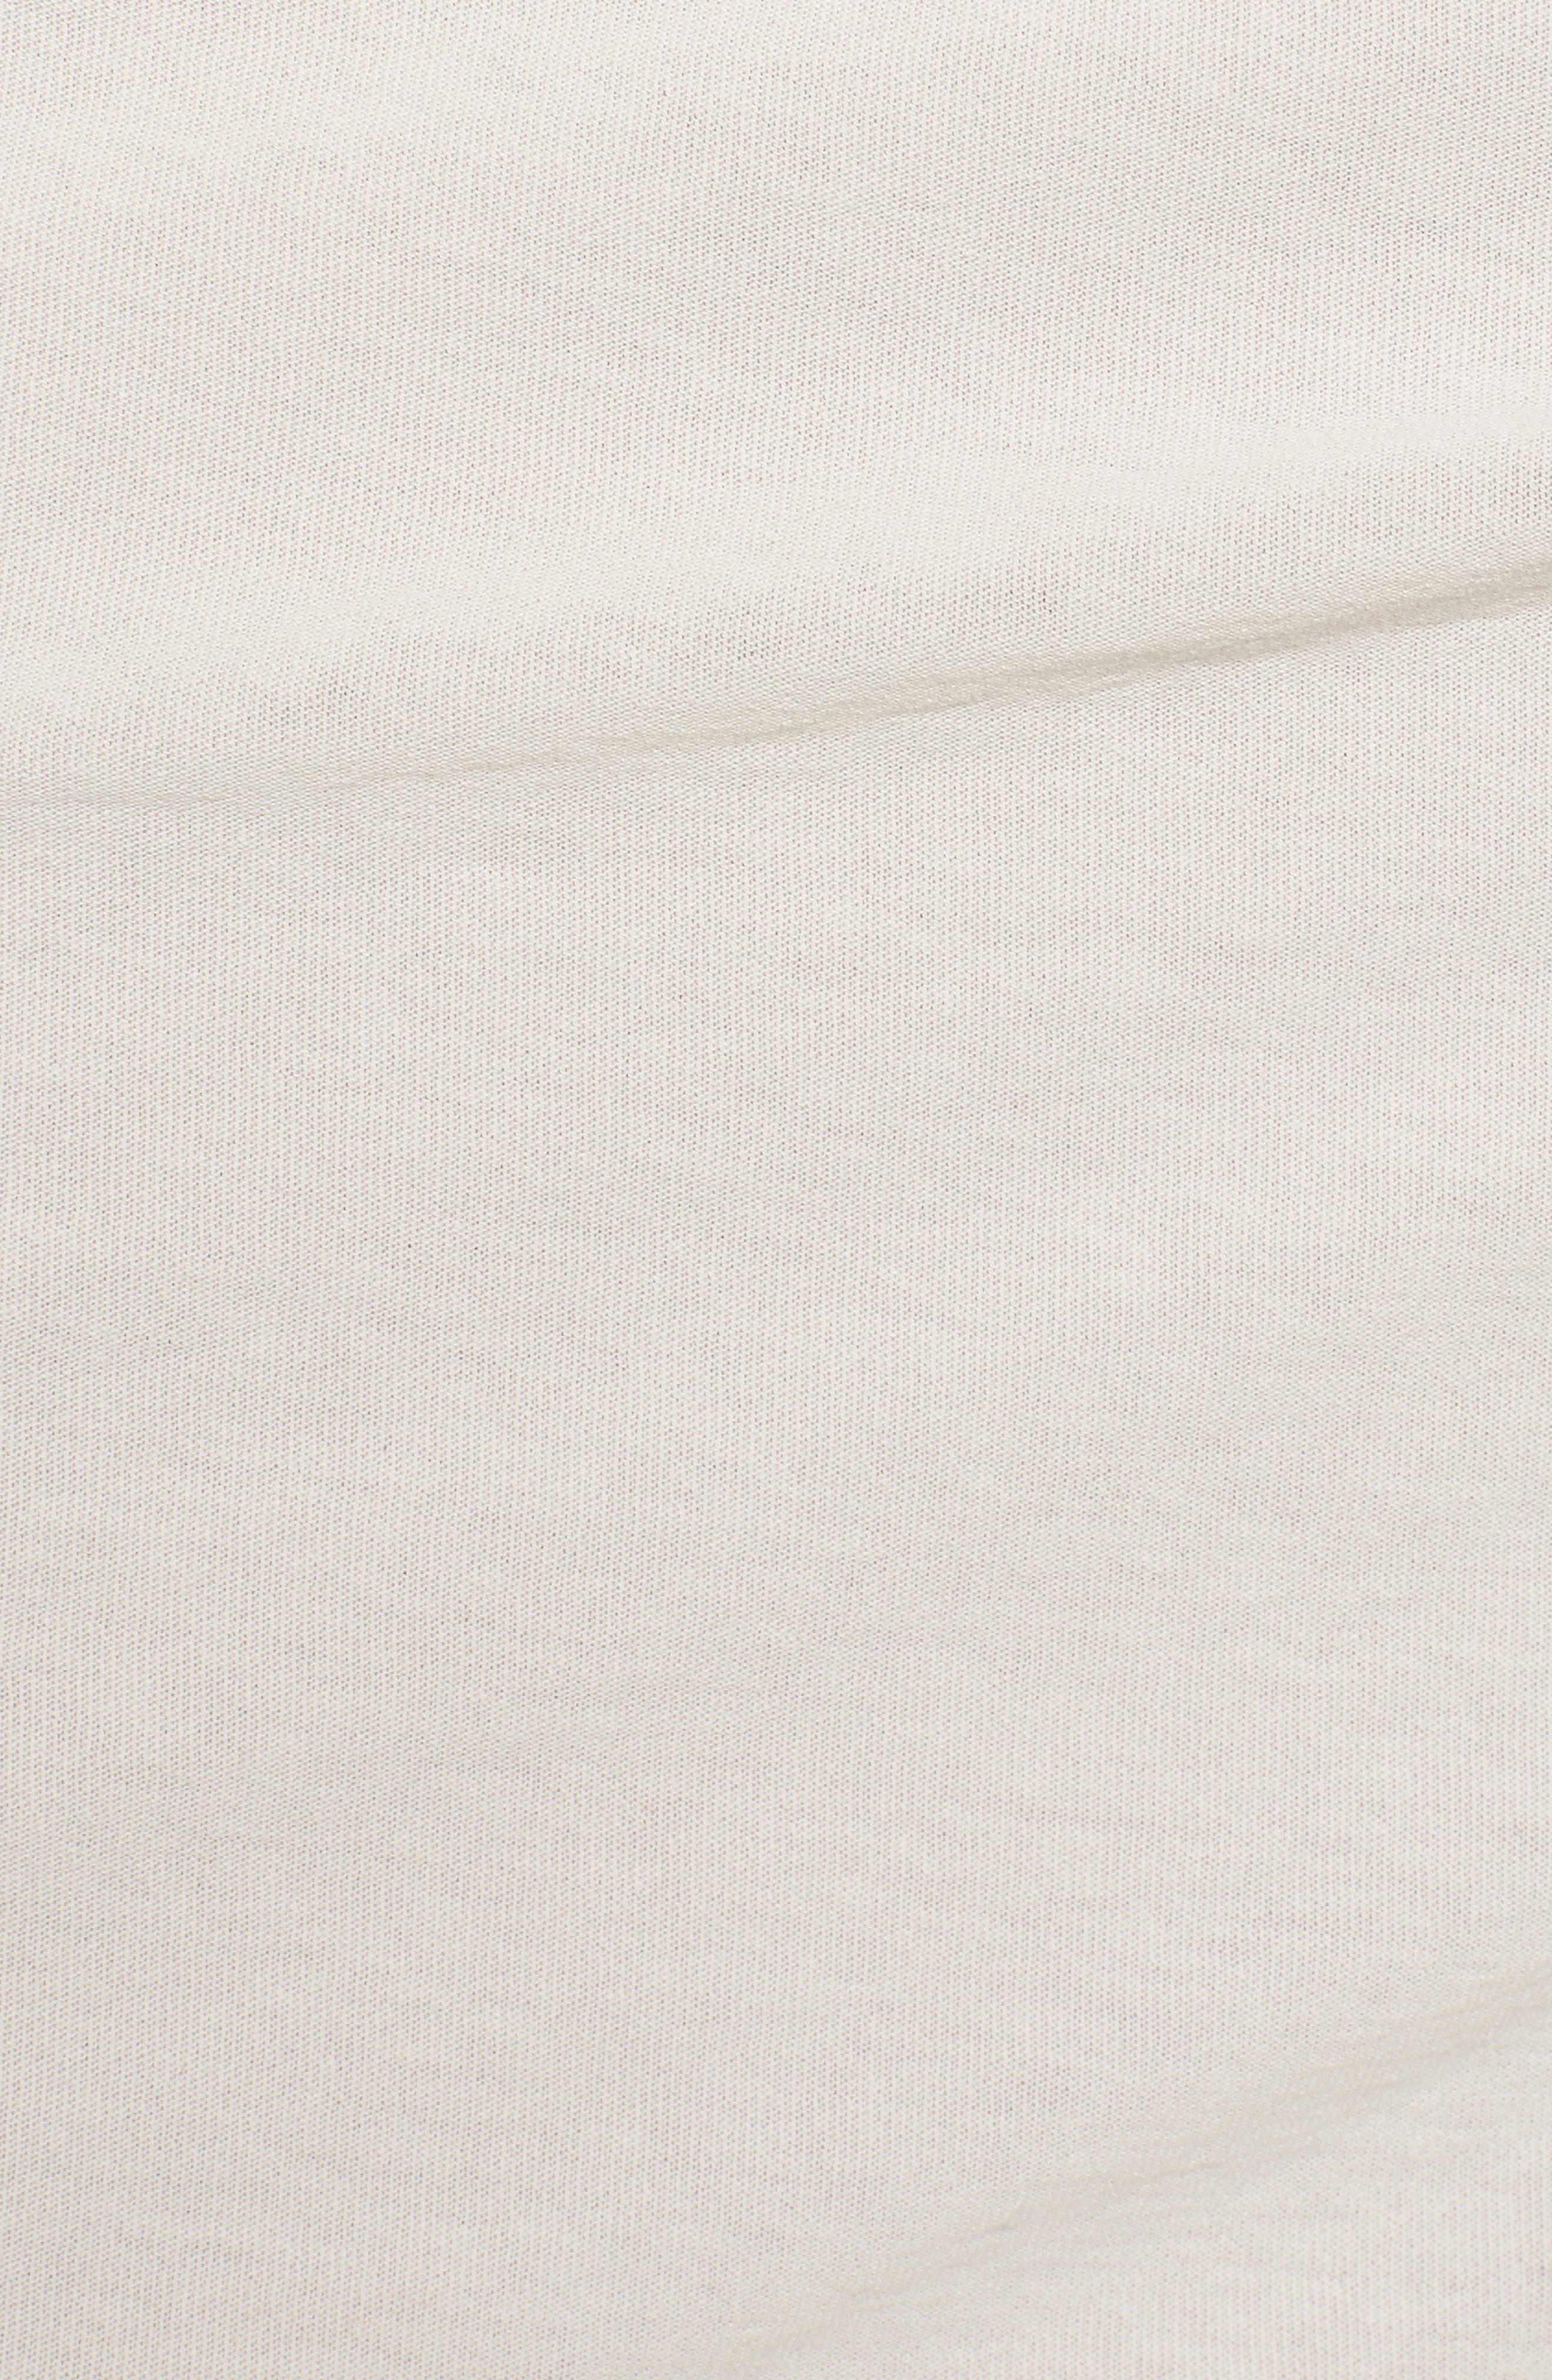 Shirred Cotton Dress,                             Alternate thumbnail 5, color,                             Dapple